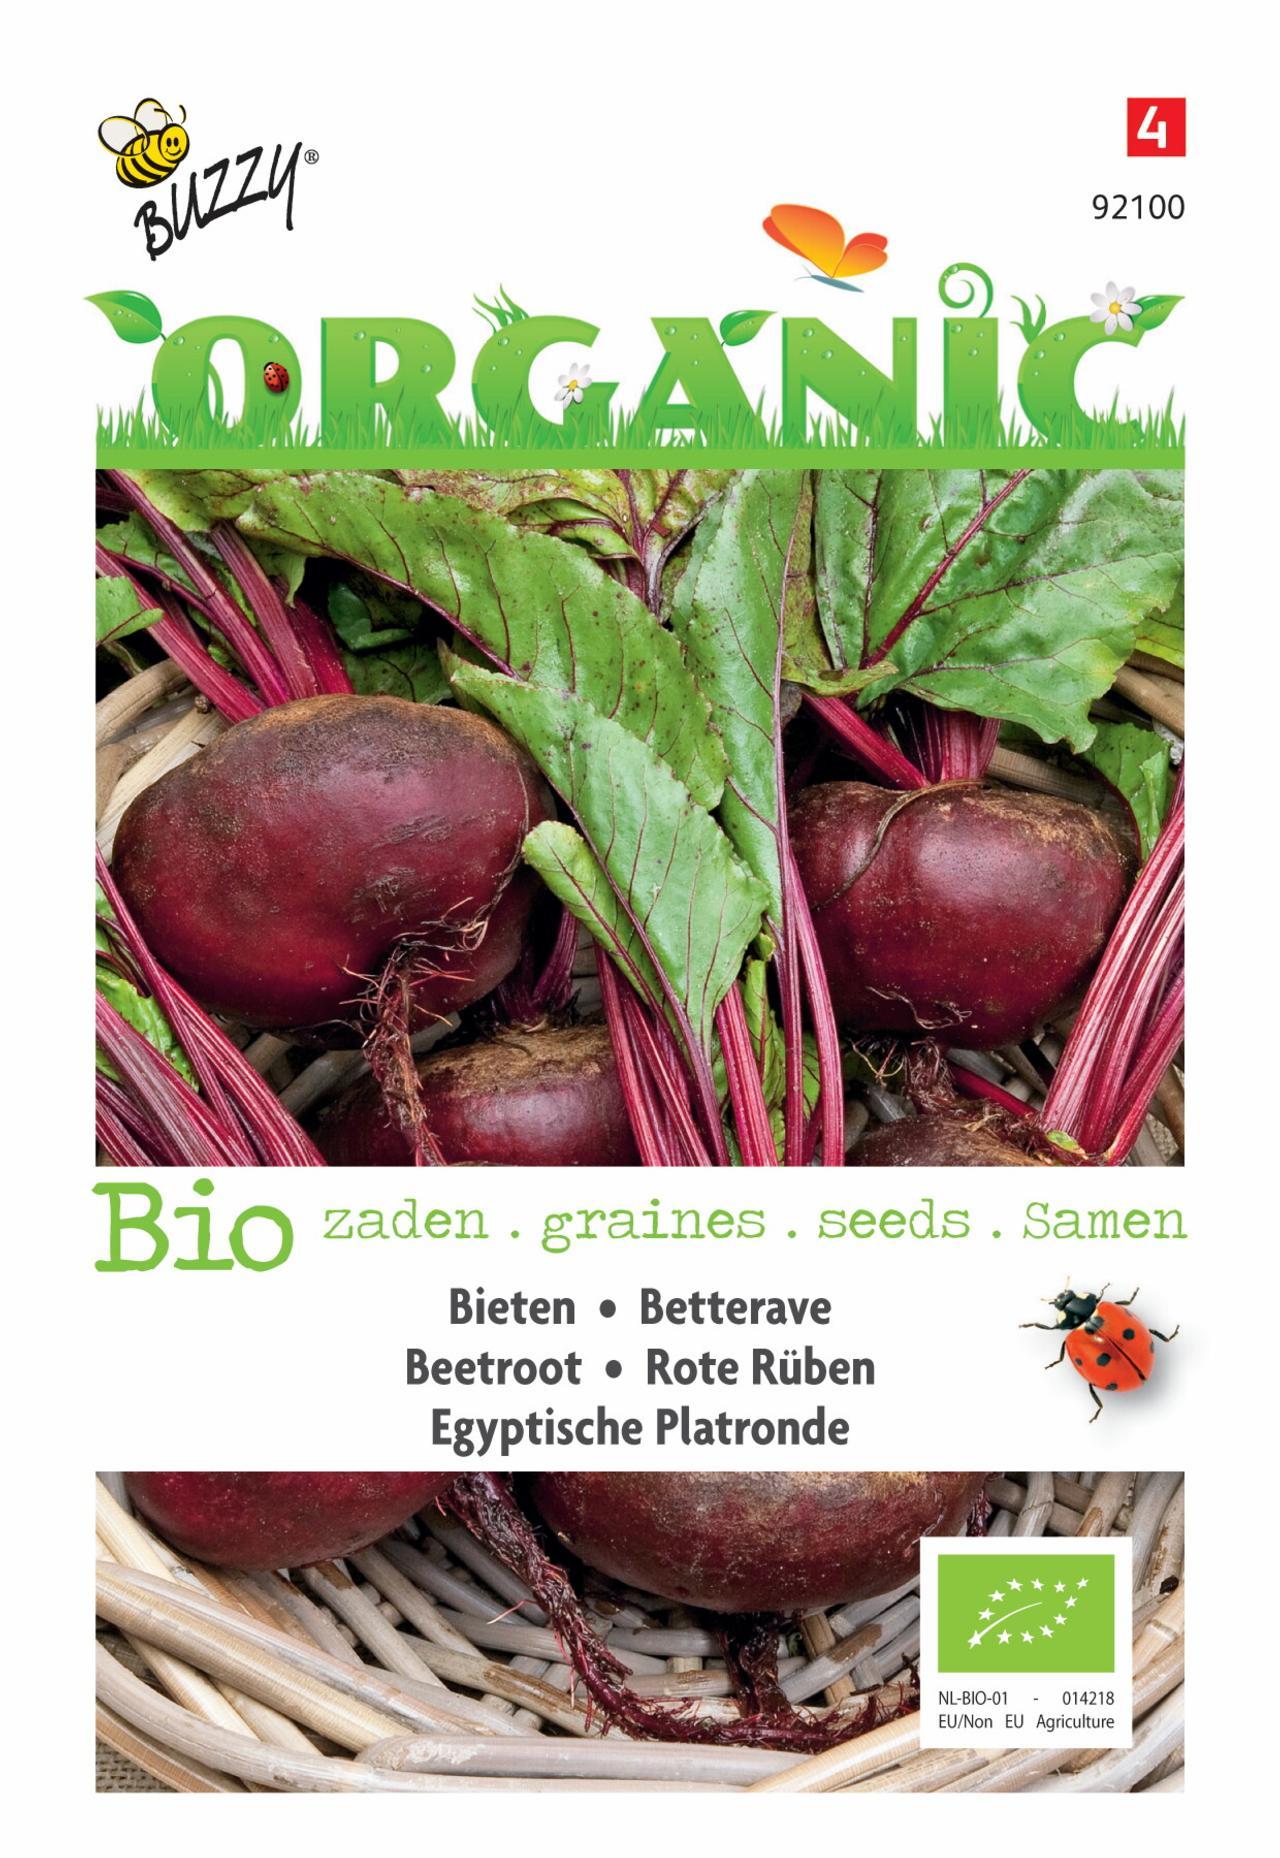 Beta vulgaris 'Egyptische Platronde' (BIO) plant